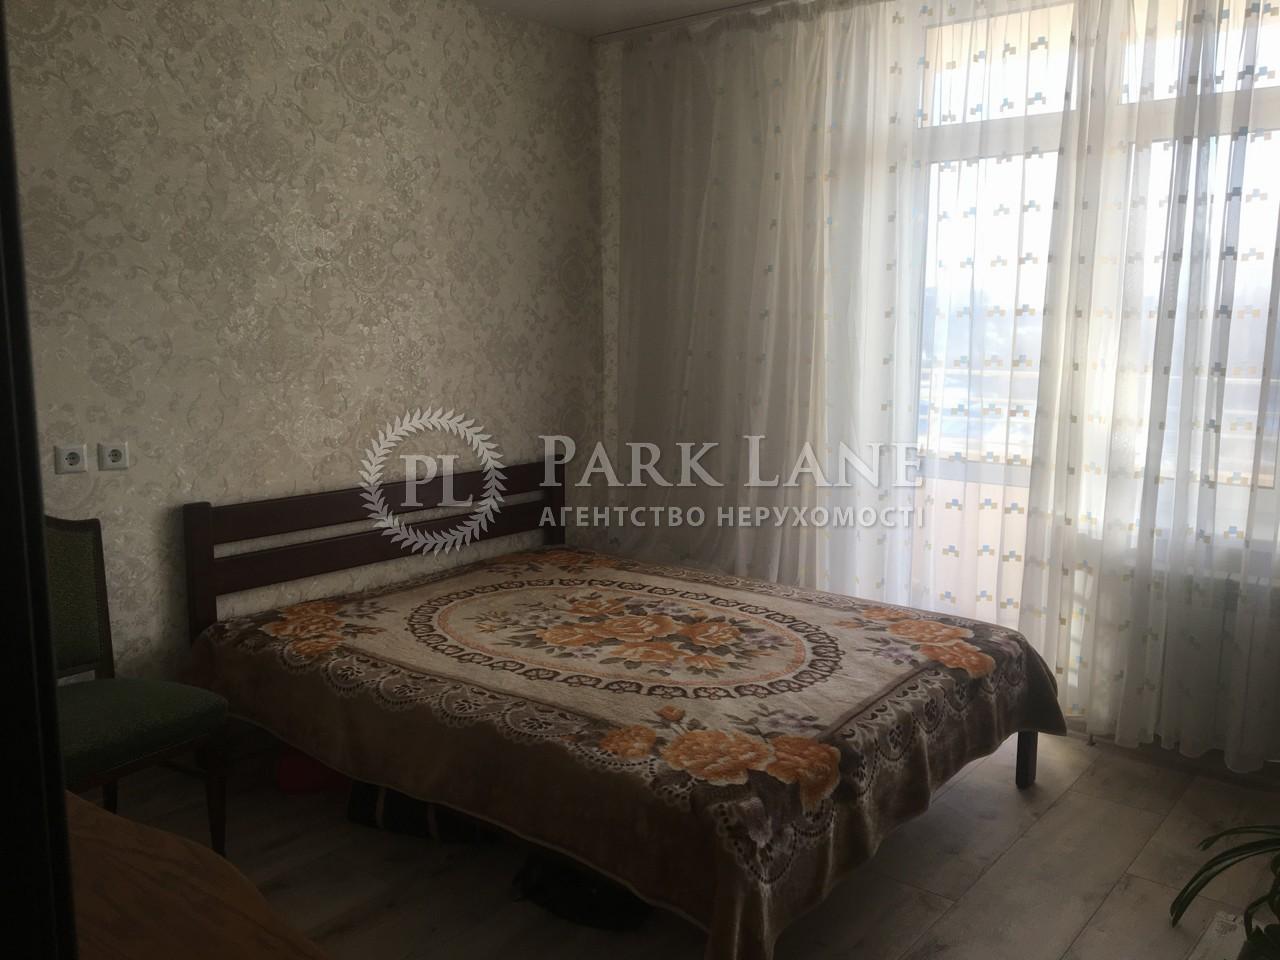 Квартира R-22442, Липкивского Василия (Урицкого), 37в, Киев - Фото 8